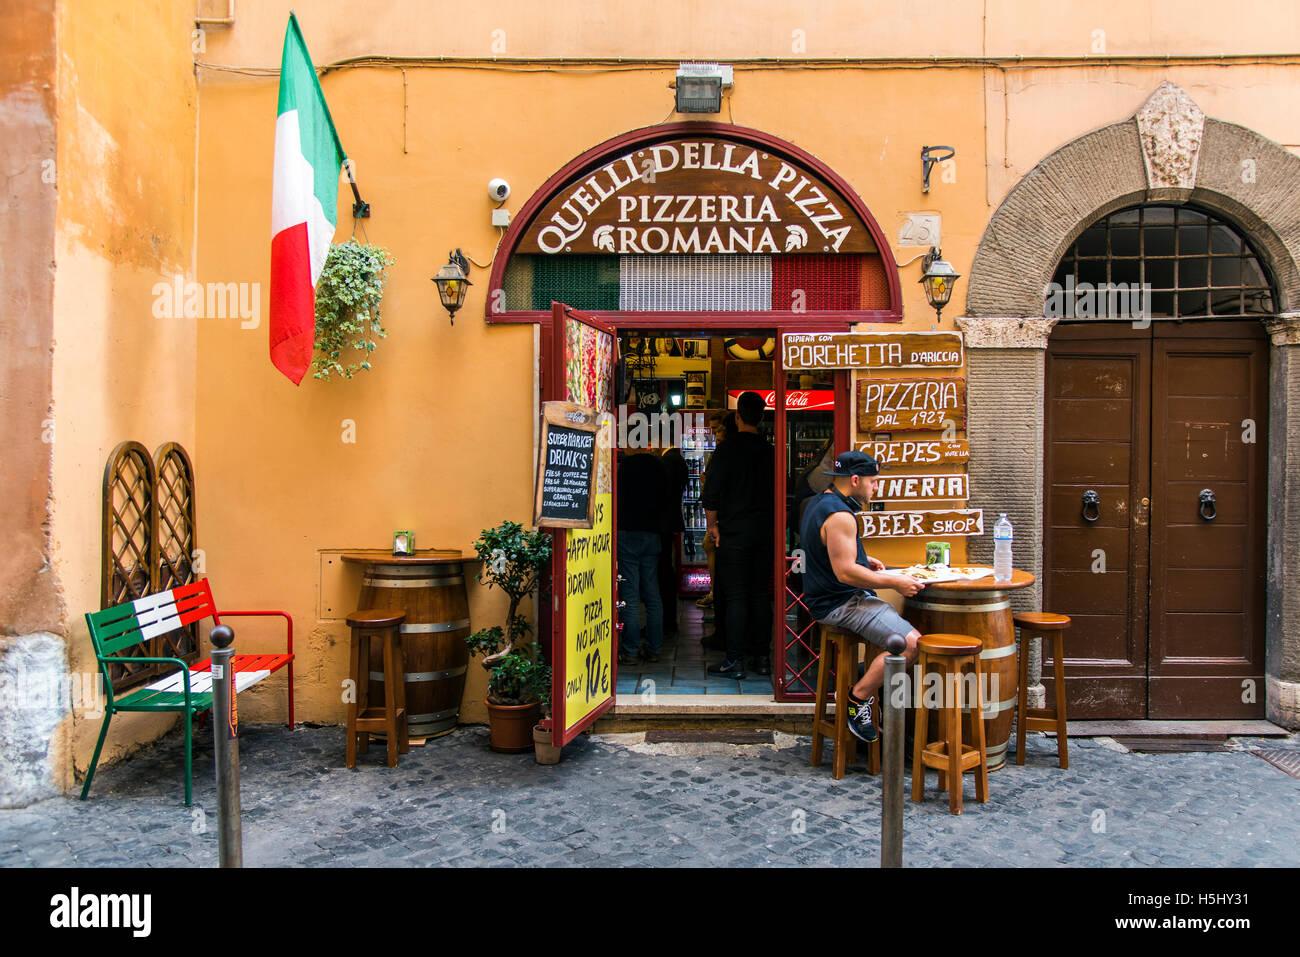 Restaurante Pizzería con bandera italiana, Roma, Lazio, Italia Imagen De Stock